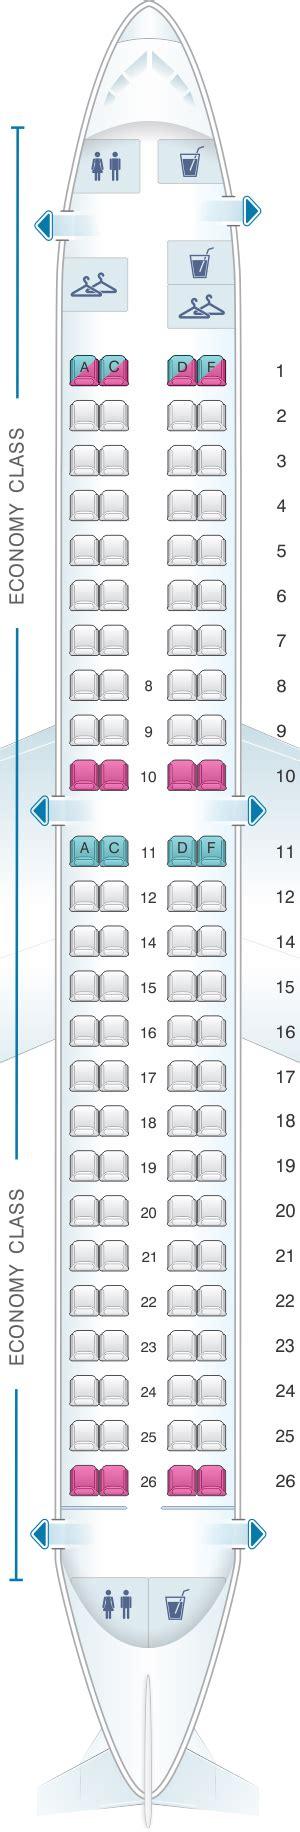 siege a380 plan de cabine air embraer 190 seatmaestro fr